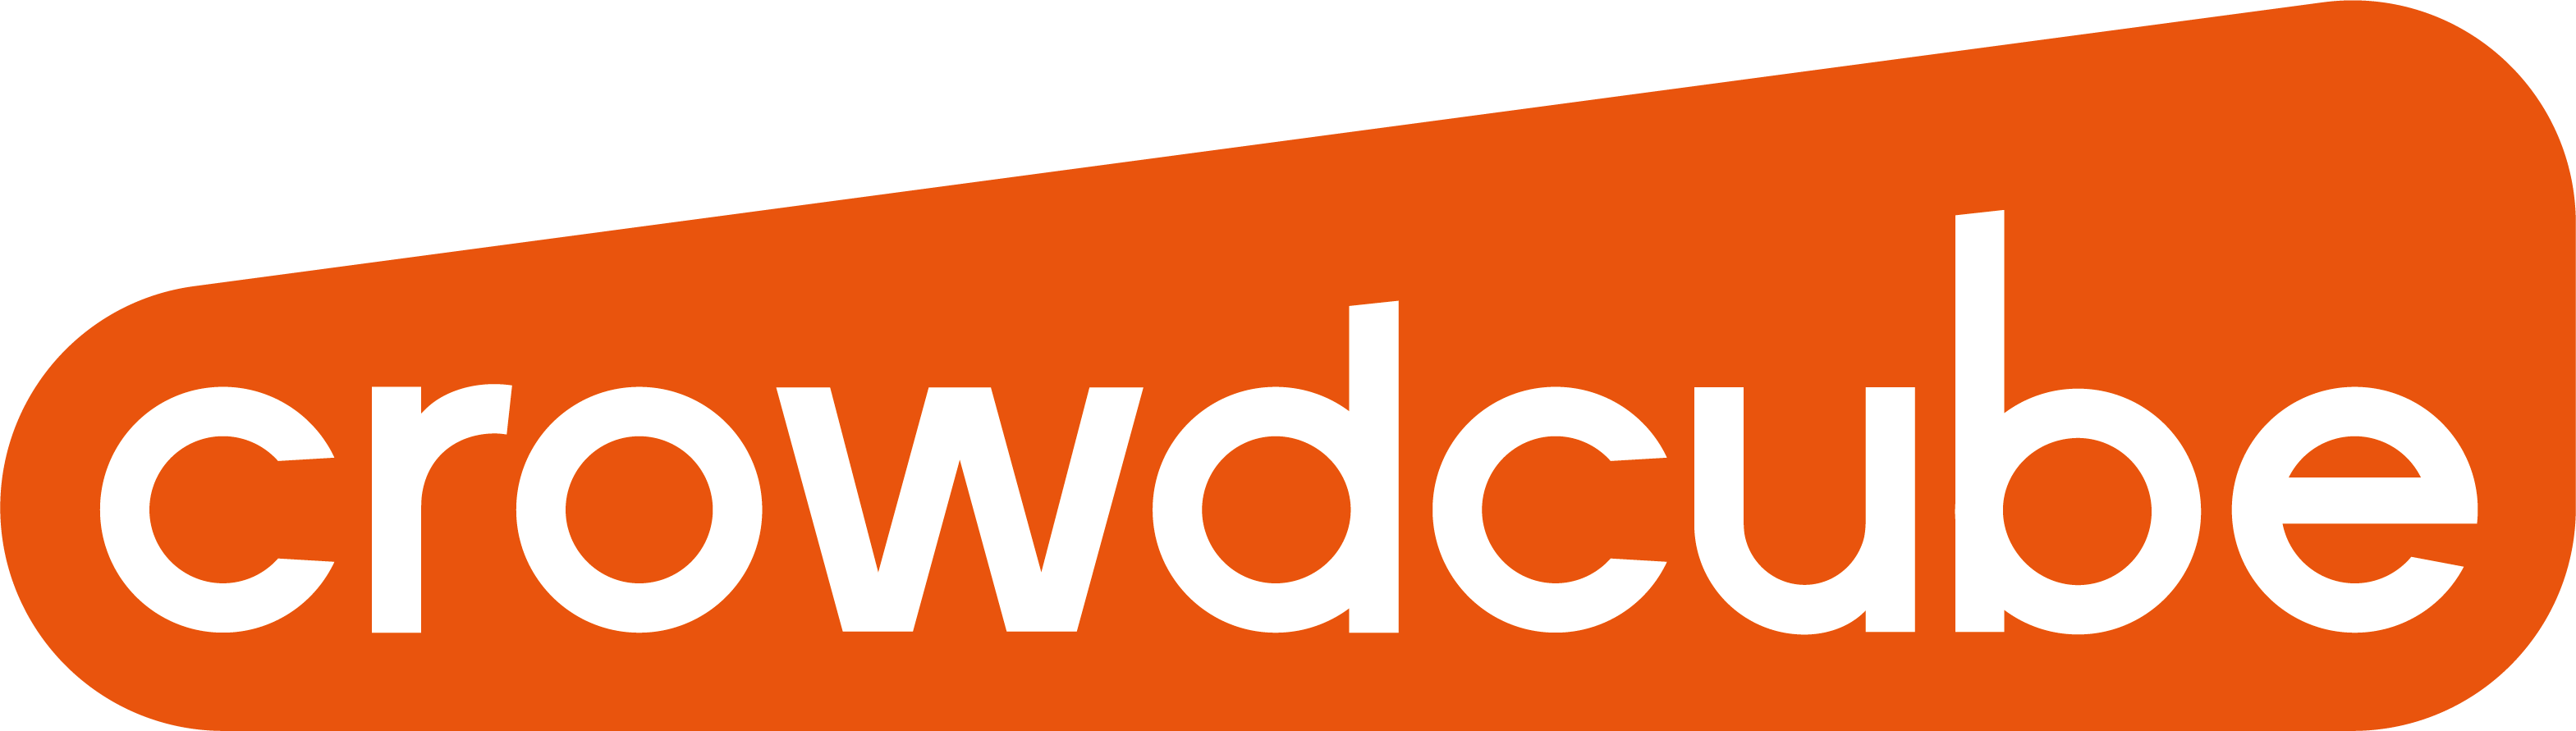 Crowdcube_Logo (1)